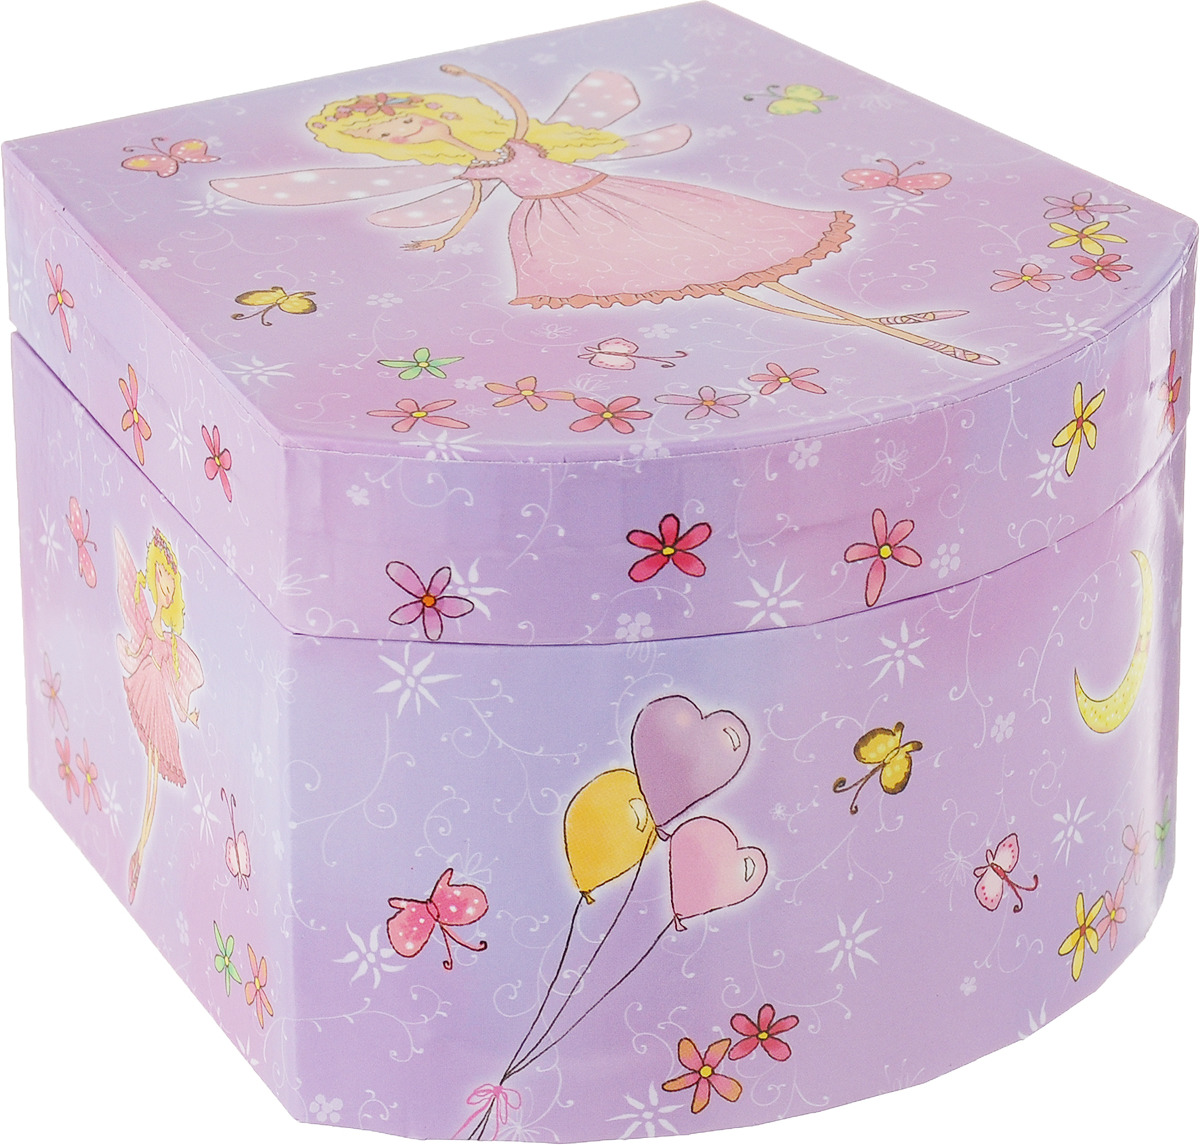 Музыкальная шкатулка Jakos, 411000-411904, фиолетовый